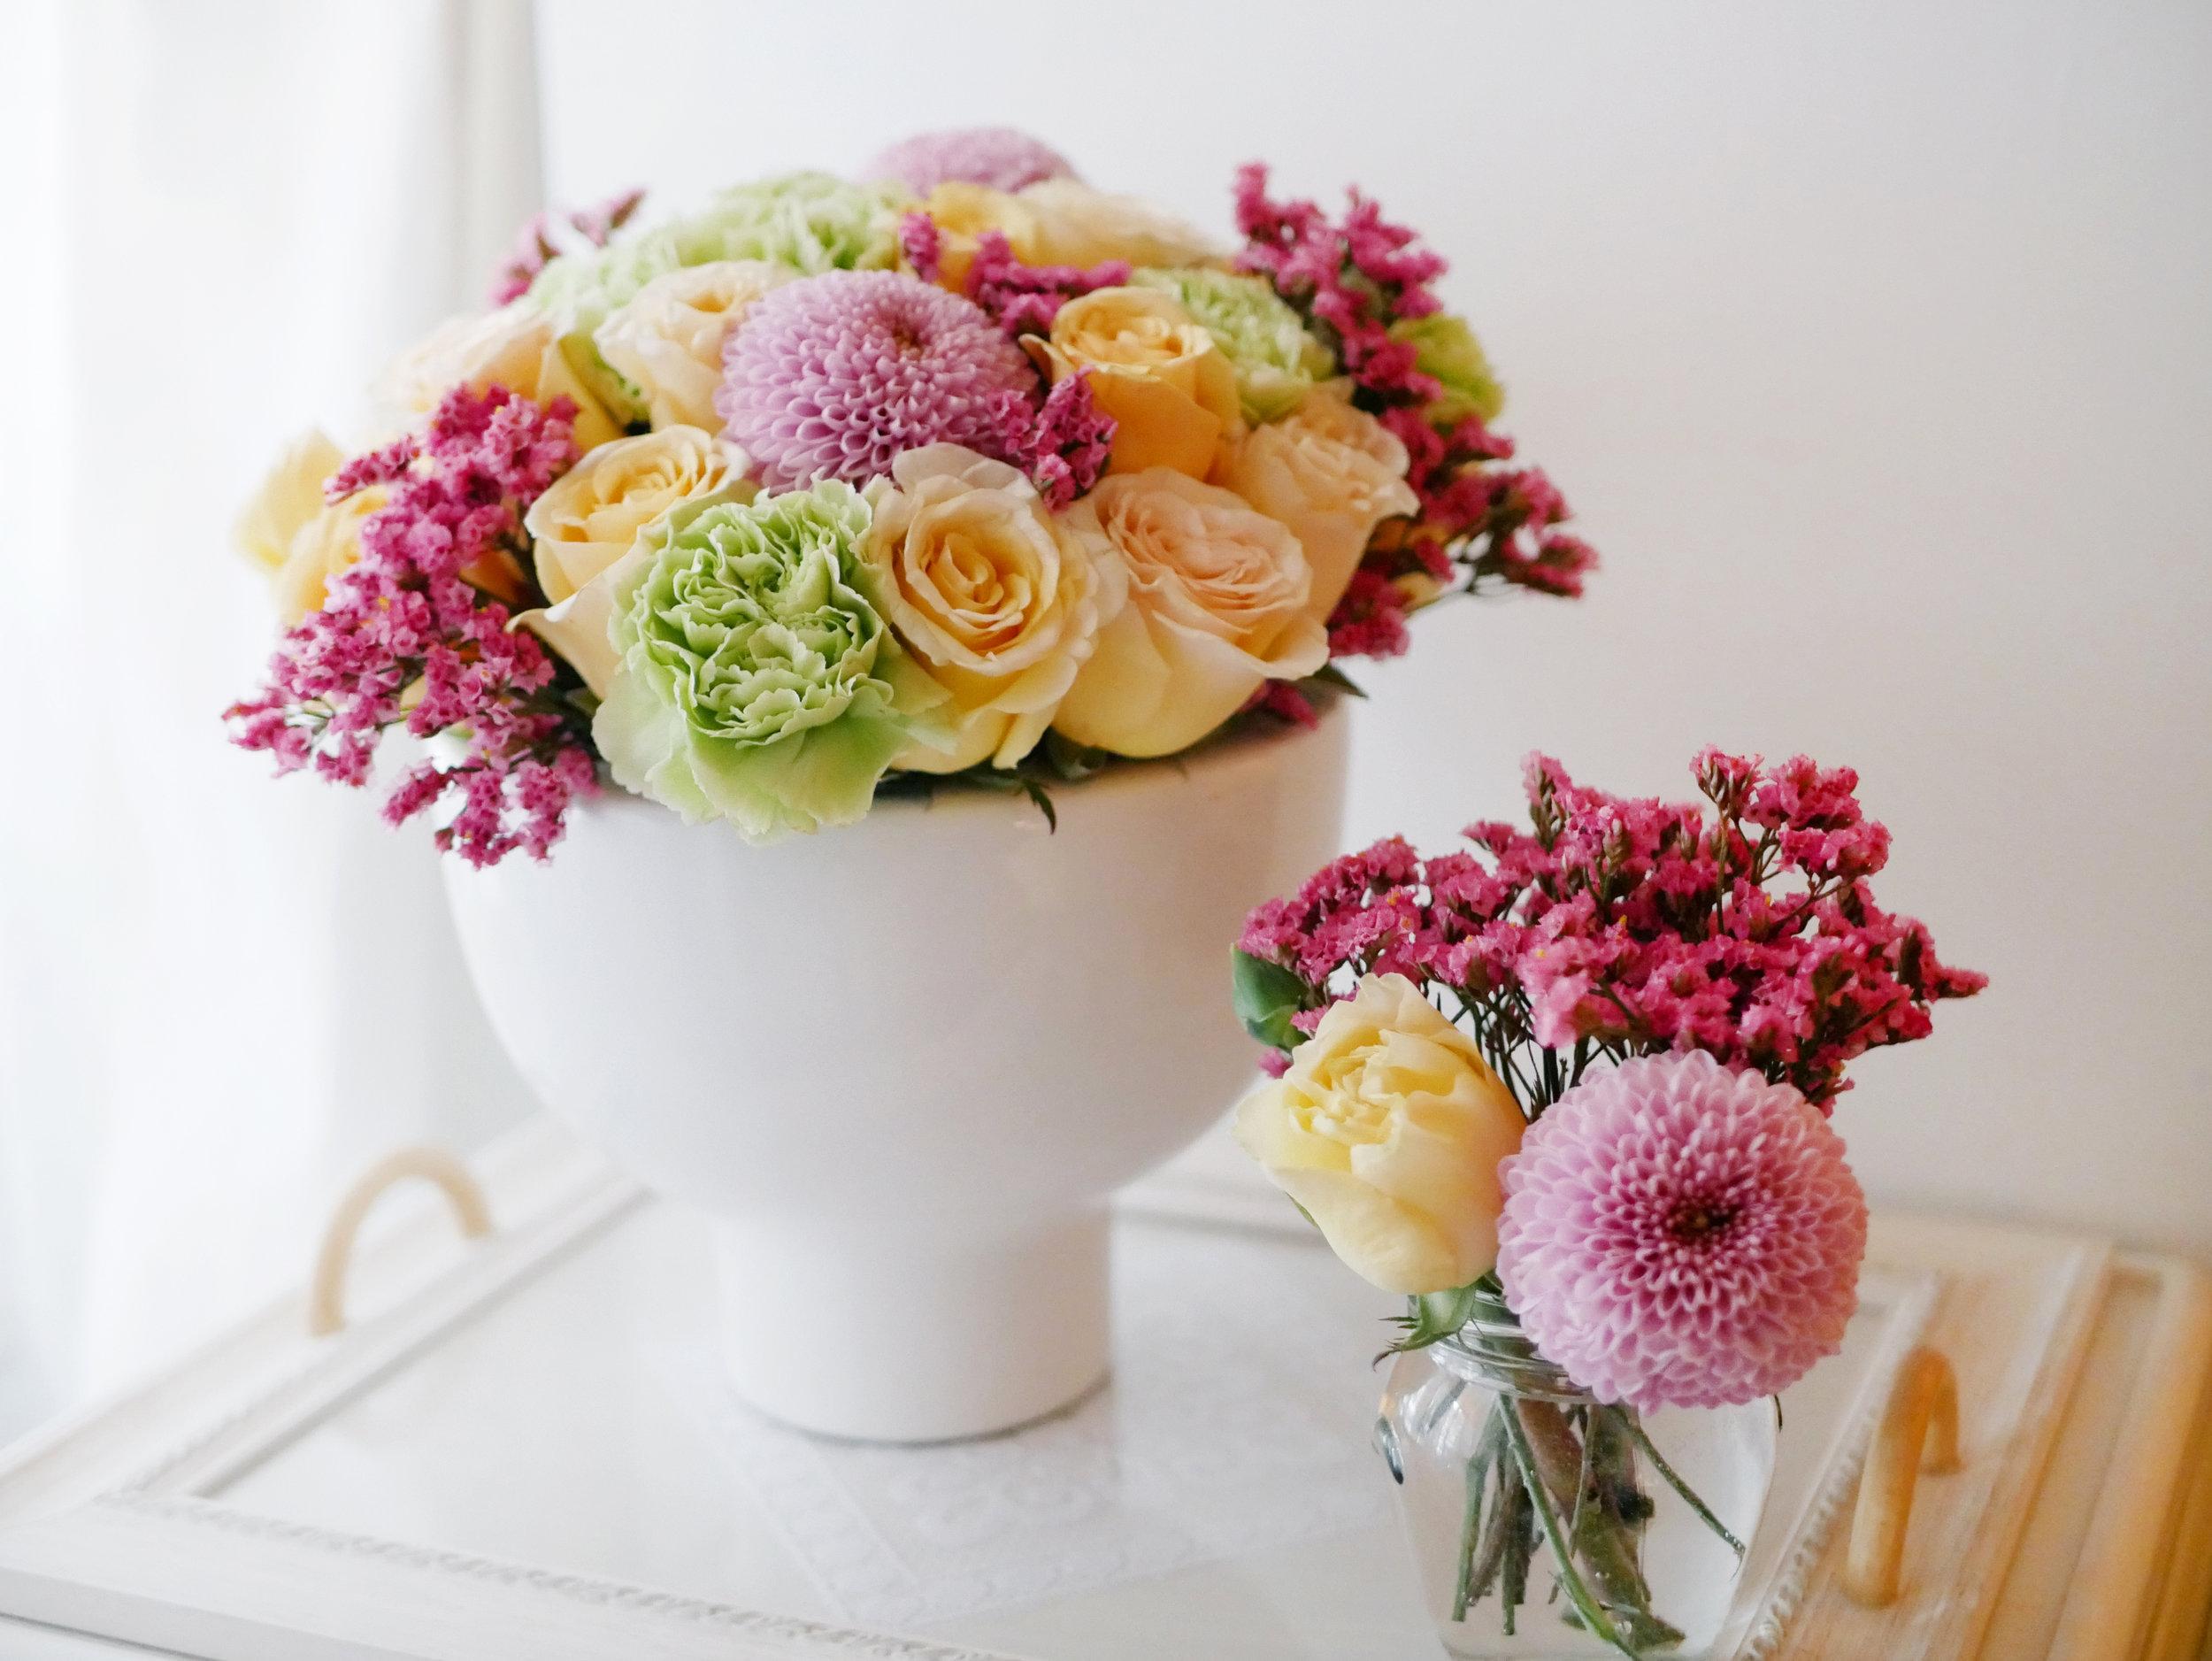 BONITO DESIGN EVENTS EASTER FLOWERS 13.jpg